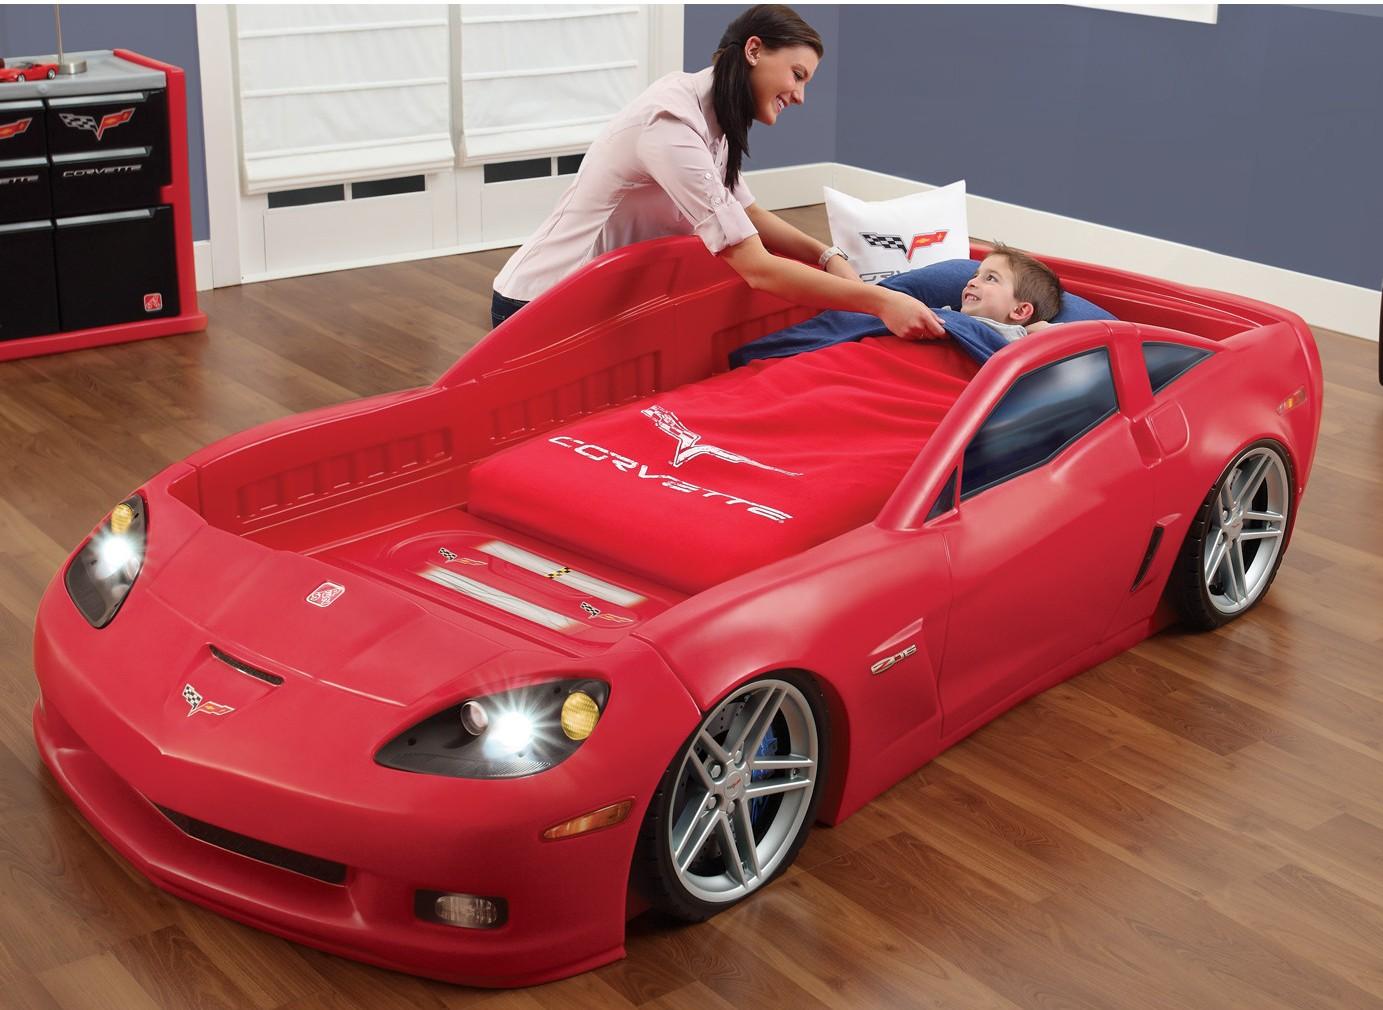 Mattress For Toddler Car Bed